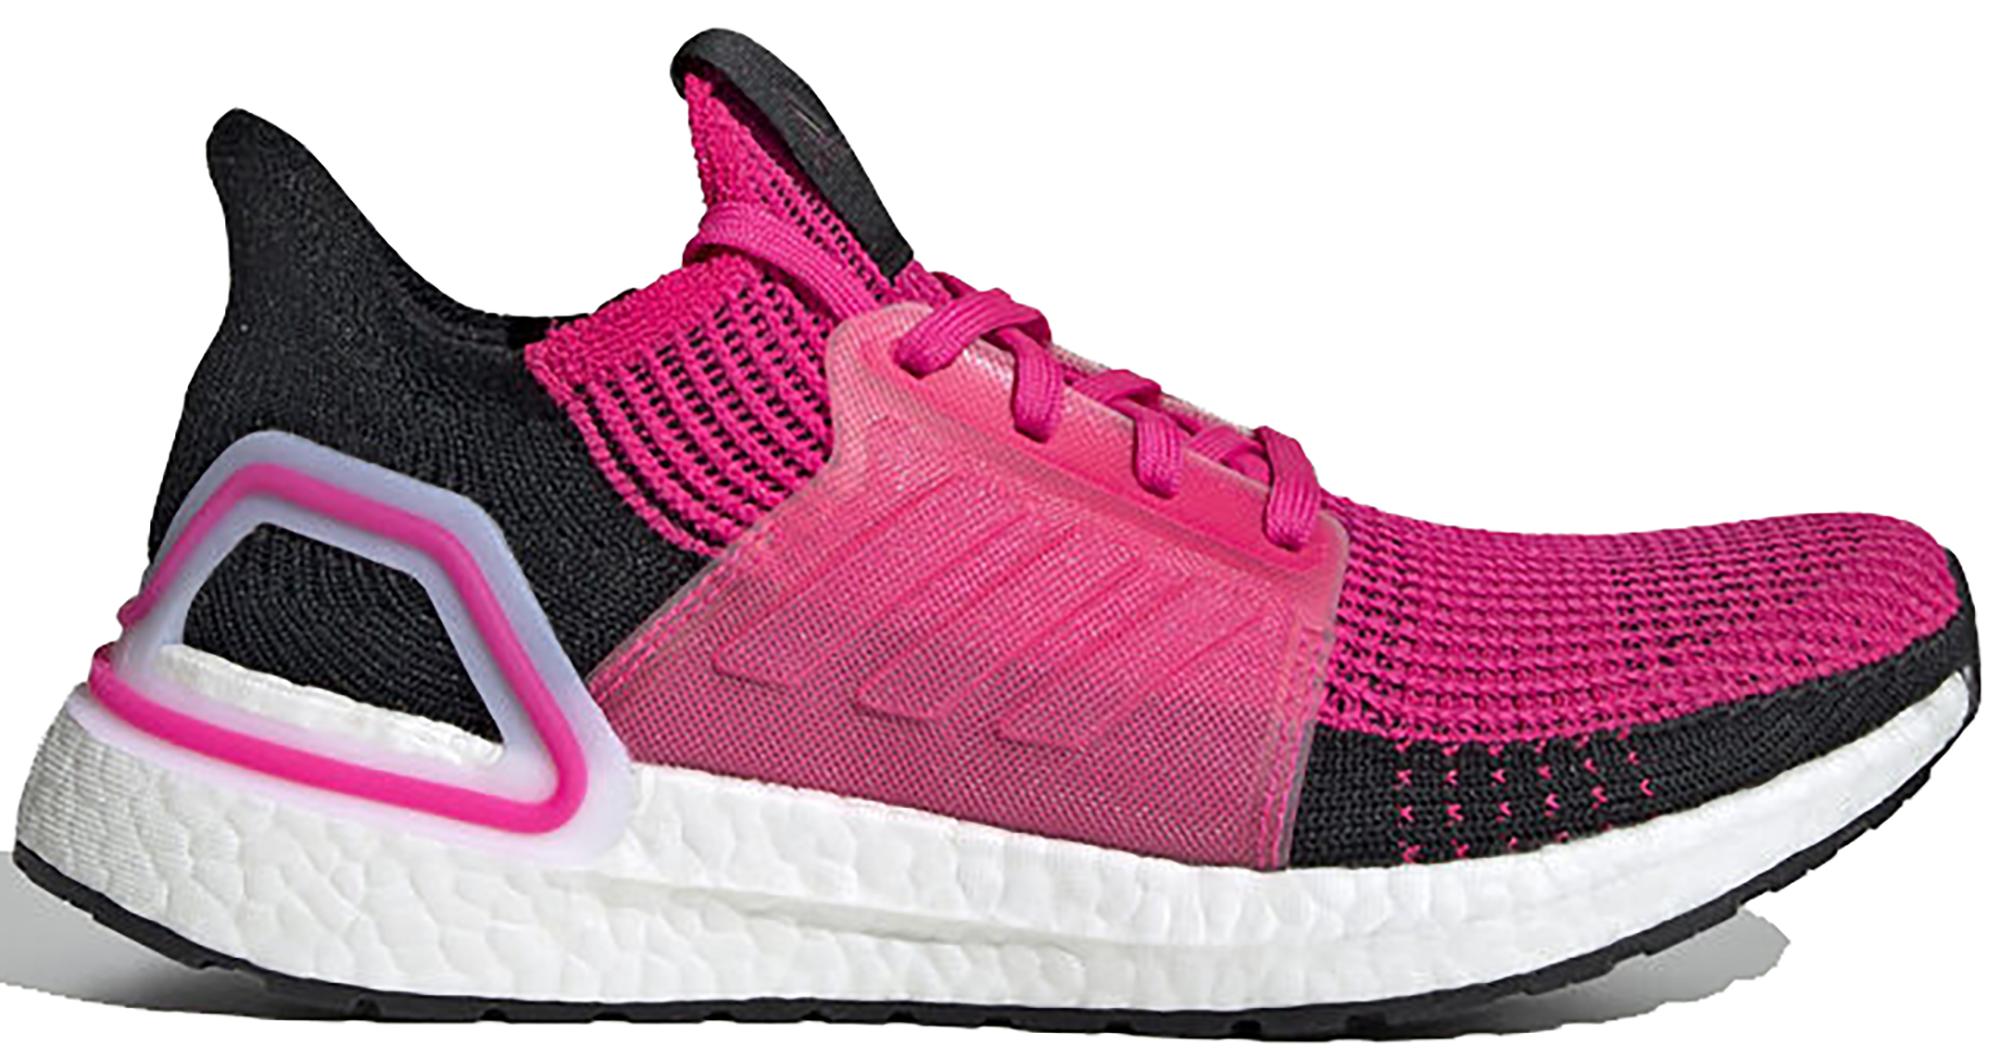 adidas Ultra Boost 19 Shock Pink Core